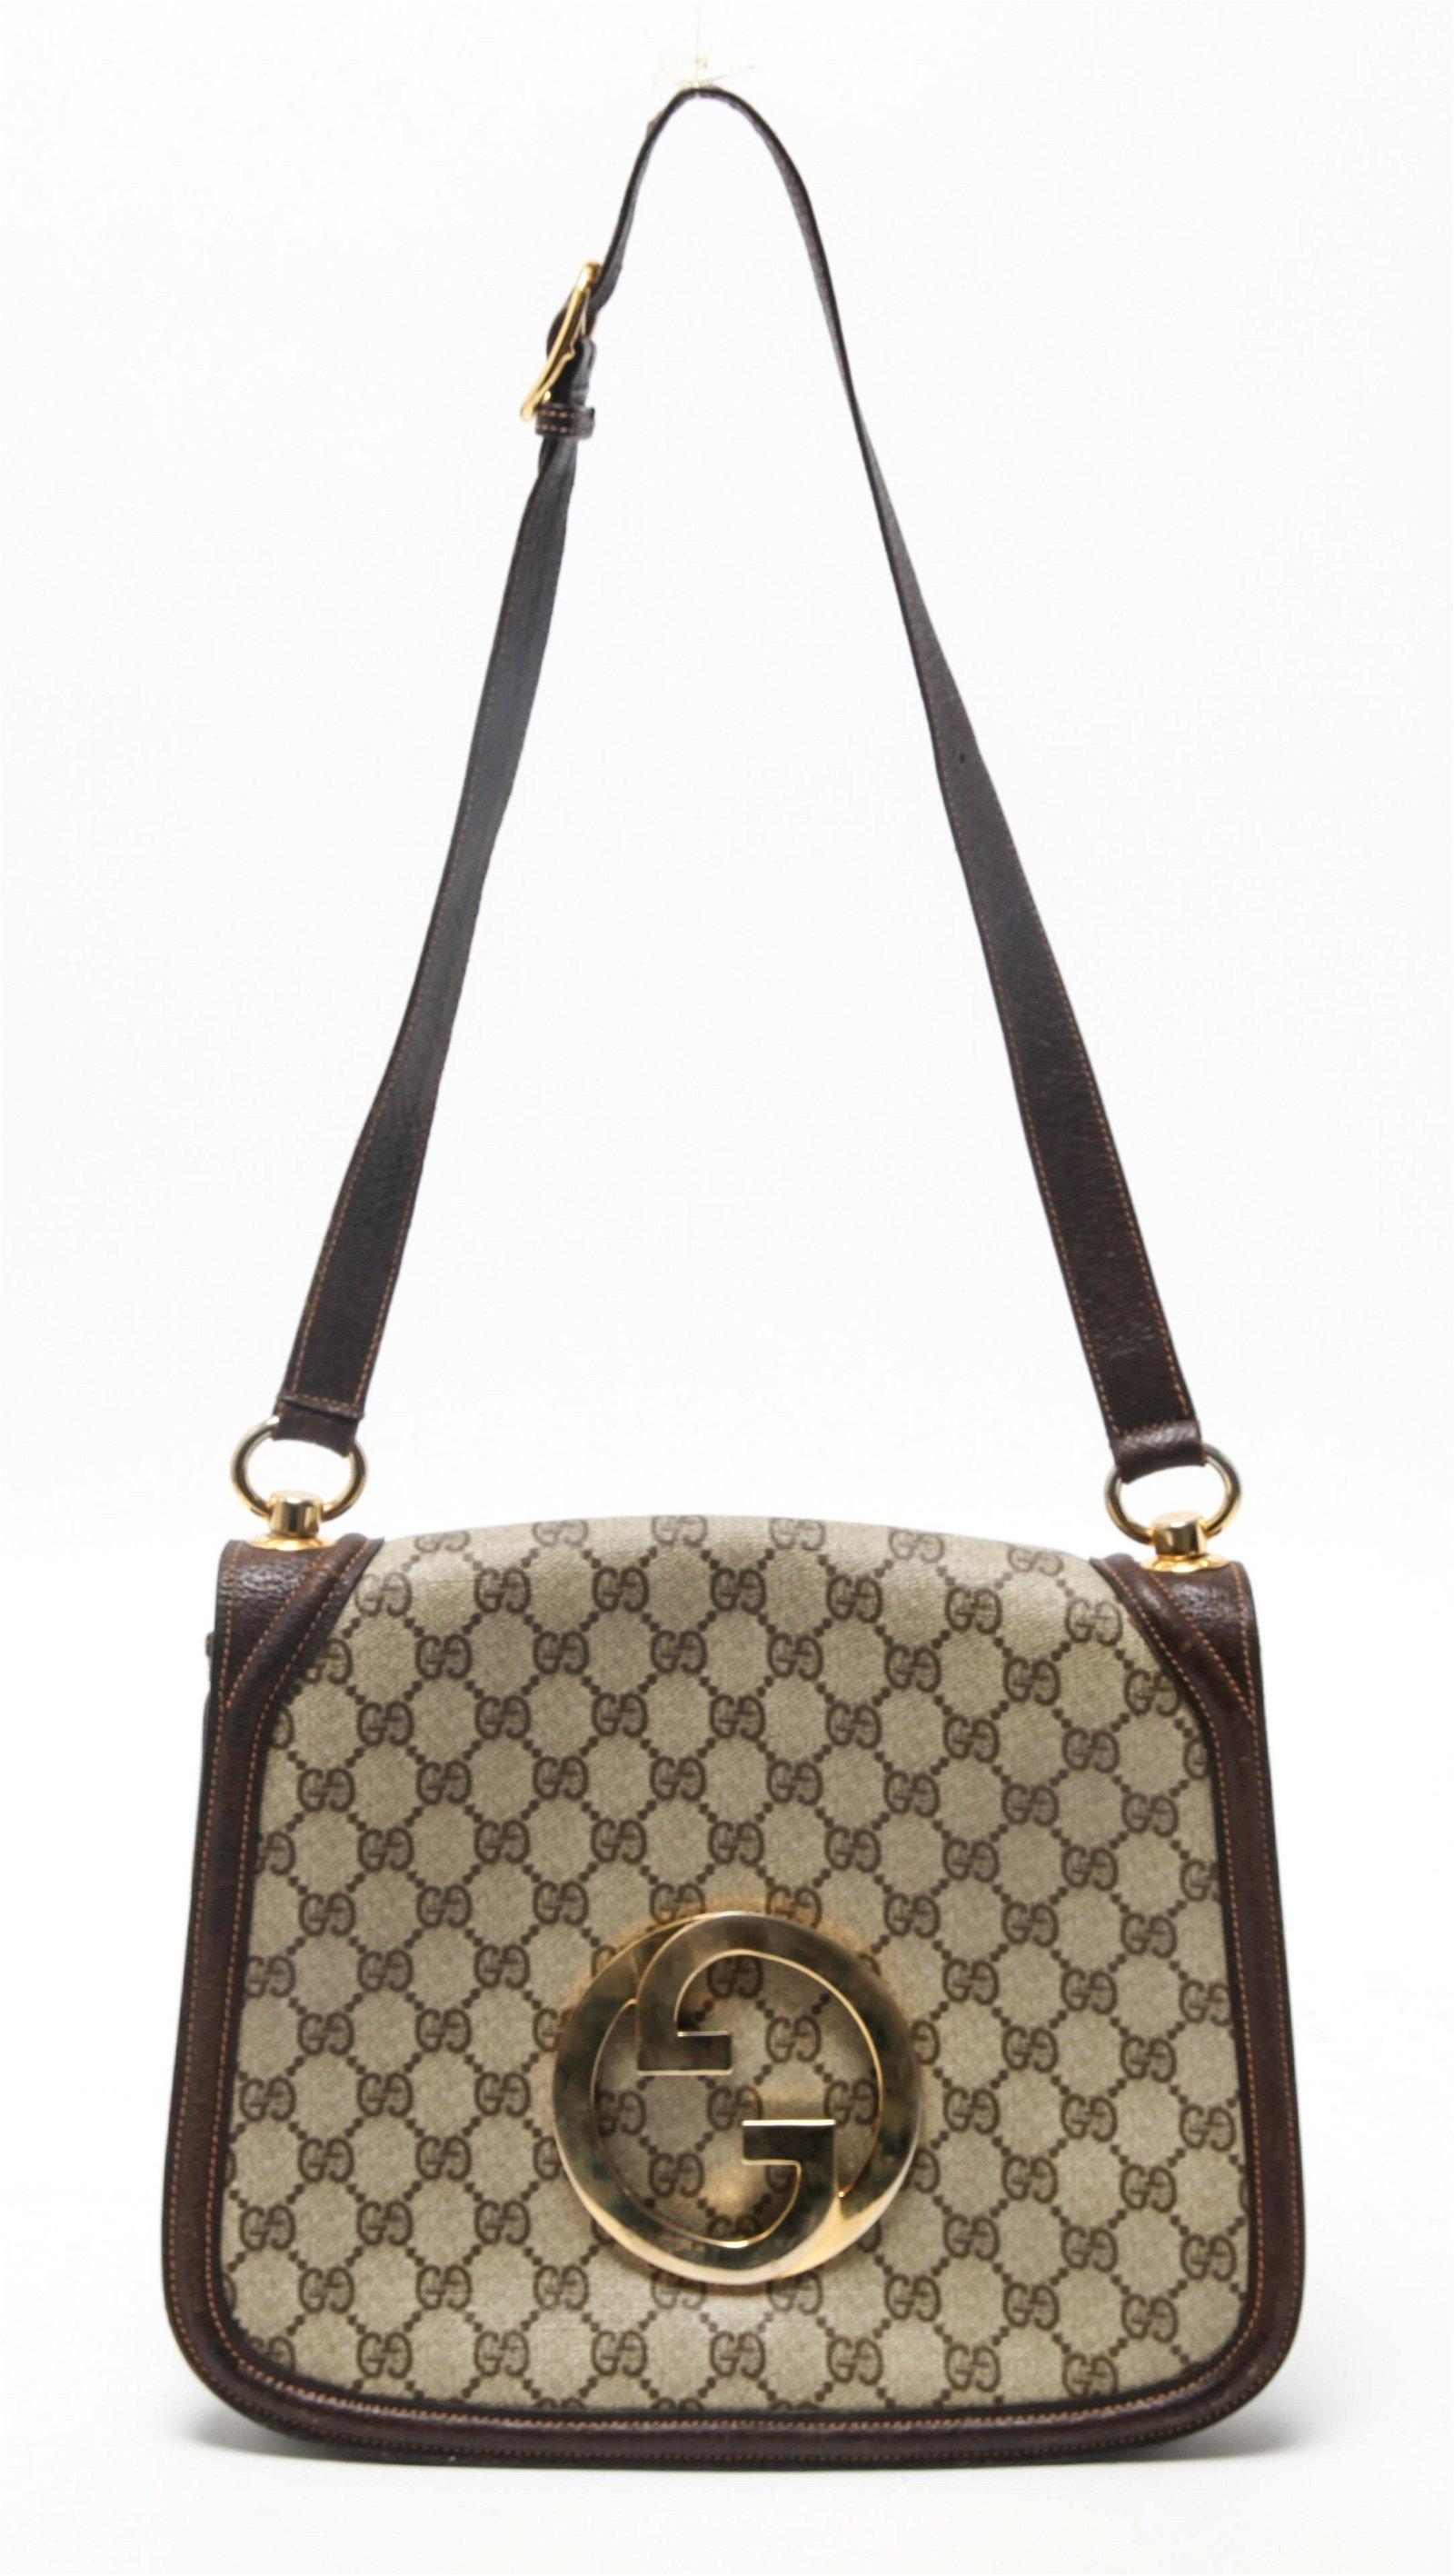 Gucci Designer Monogram Canvas & Leather Bag